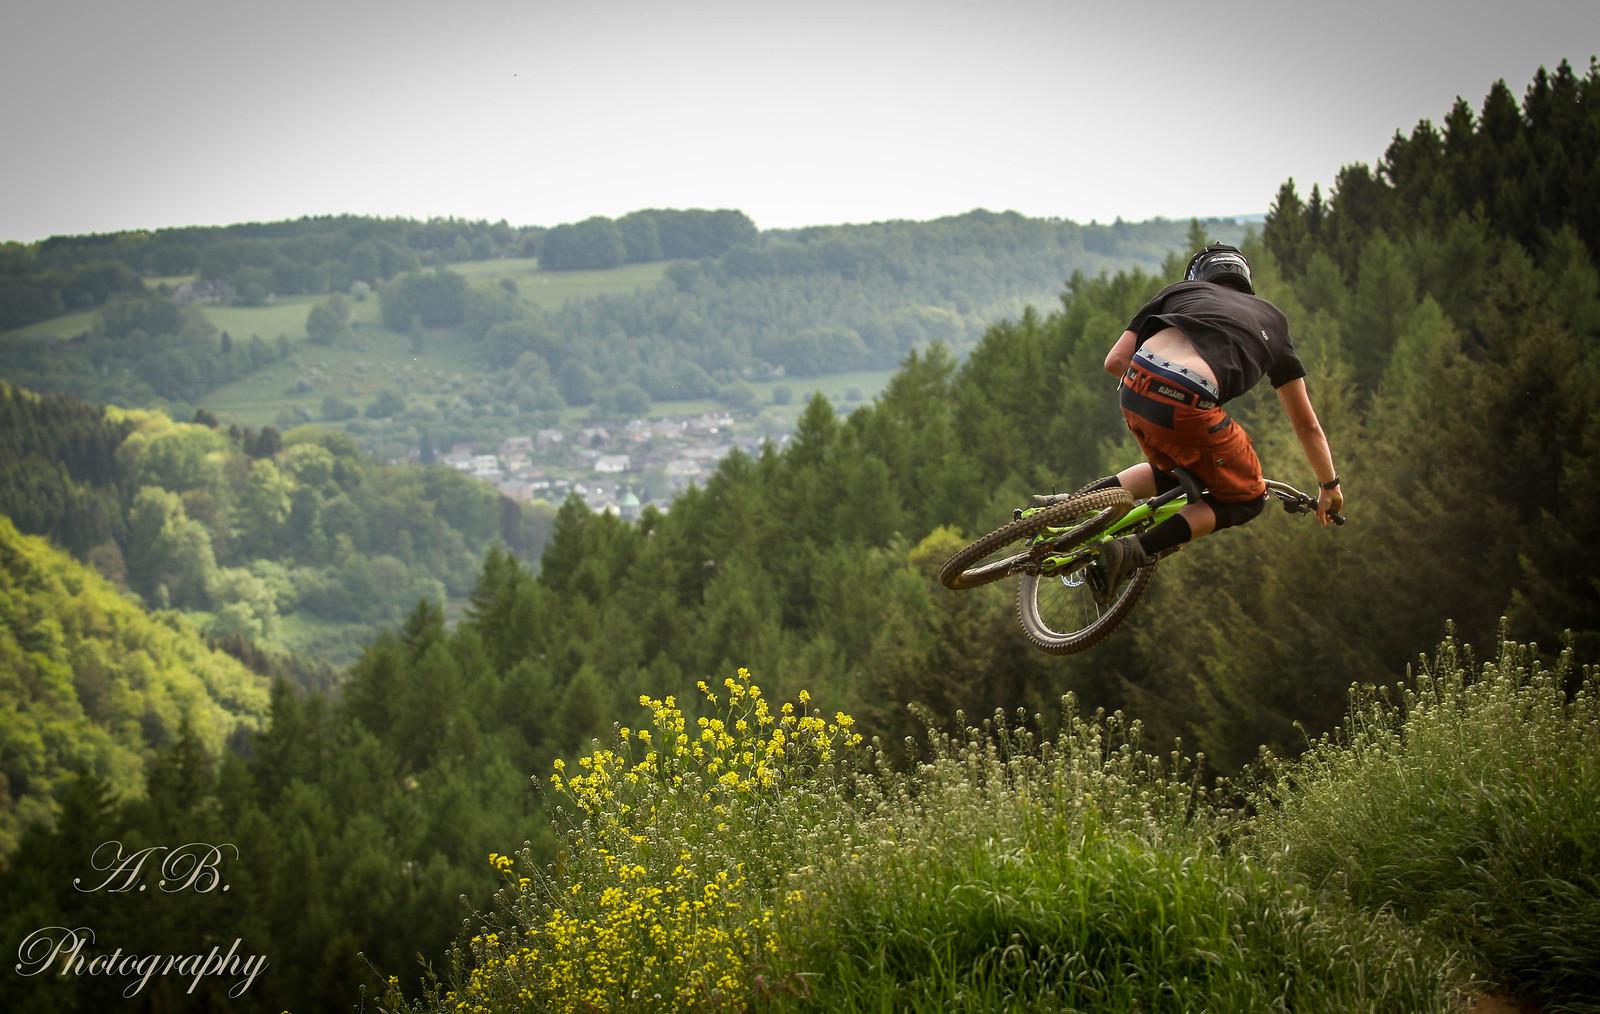 IMG 0220 - AnetaBudkova - Mountain Biking Pictures - Vital MTB